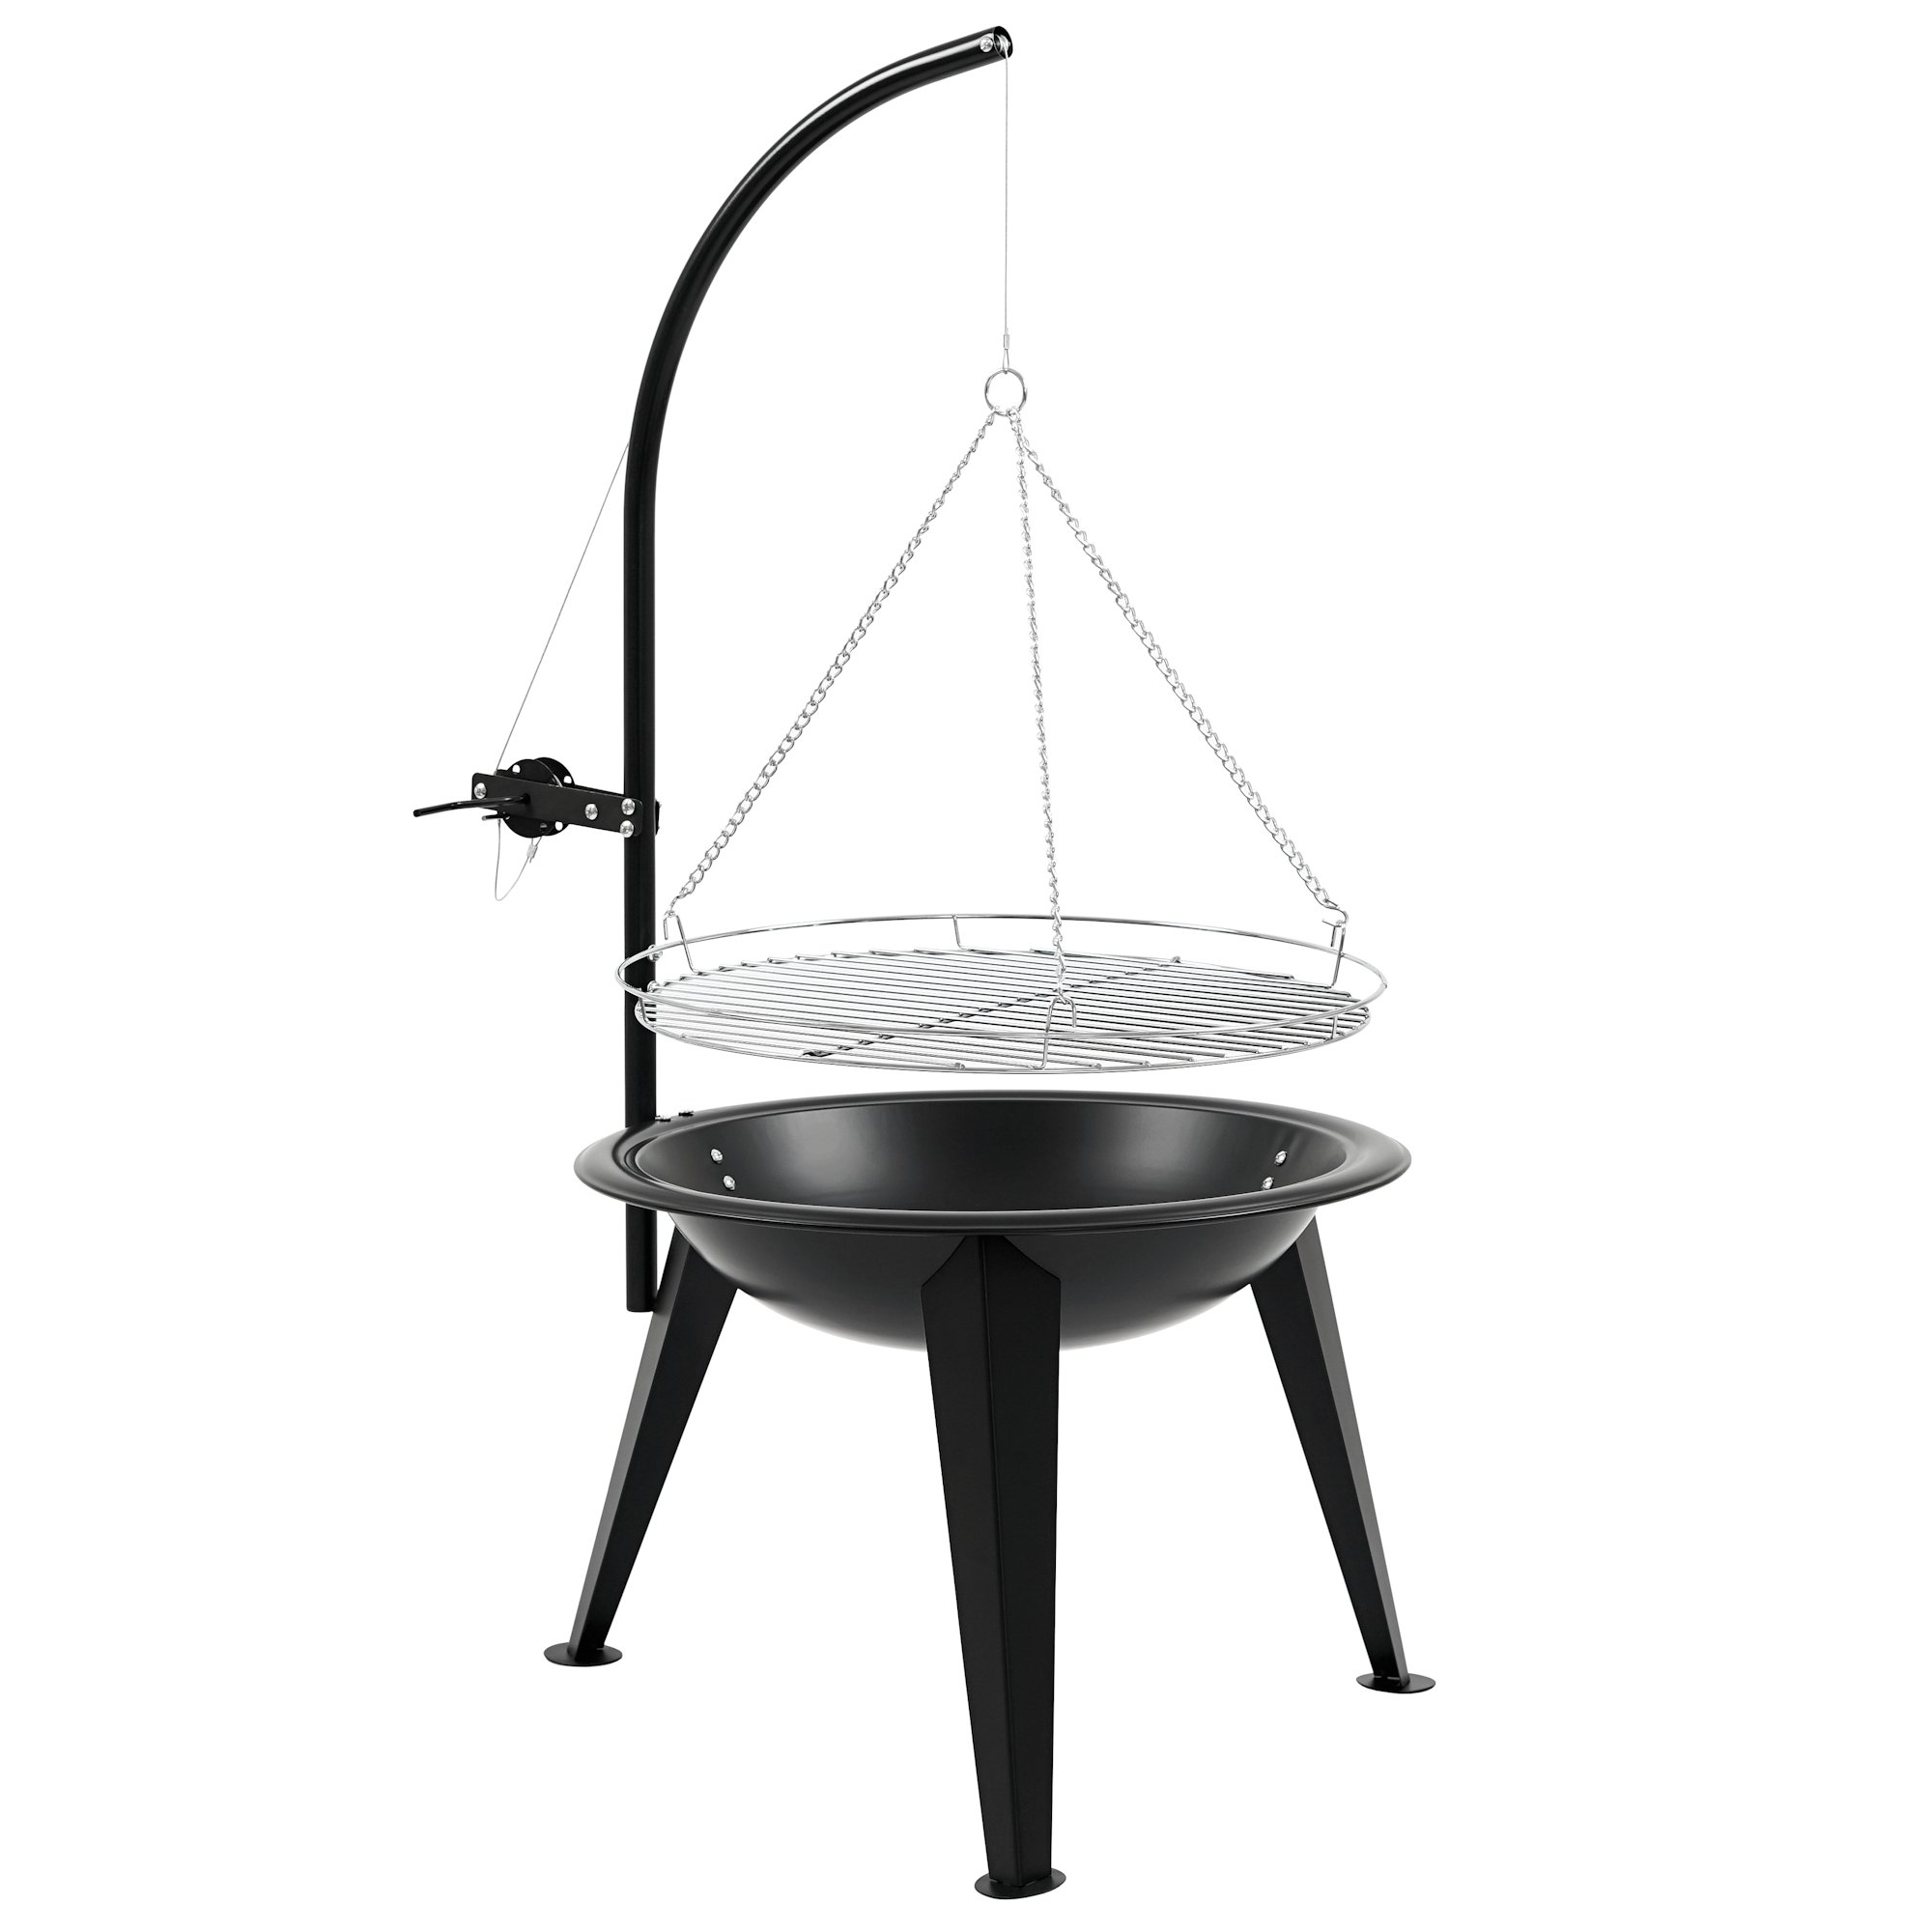 bbq toro schwenkgrill holzkohle grill 55 cm schwenker mit grillrost bbq der. Black Bedroom Furniture Sets. Home Design Ideas